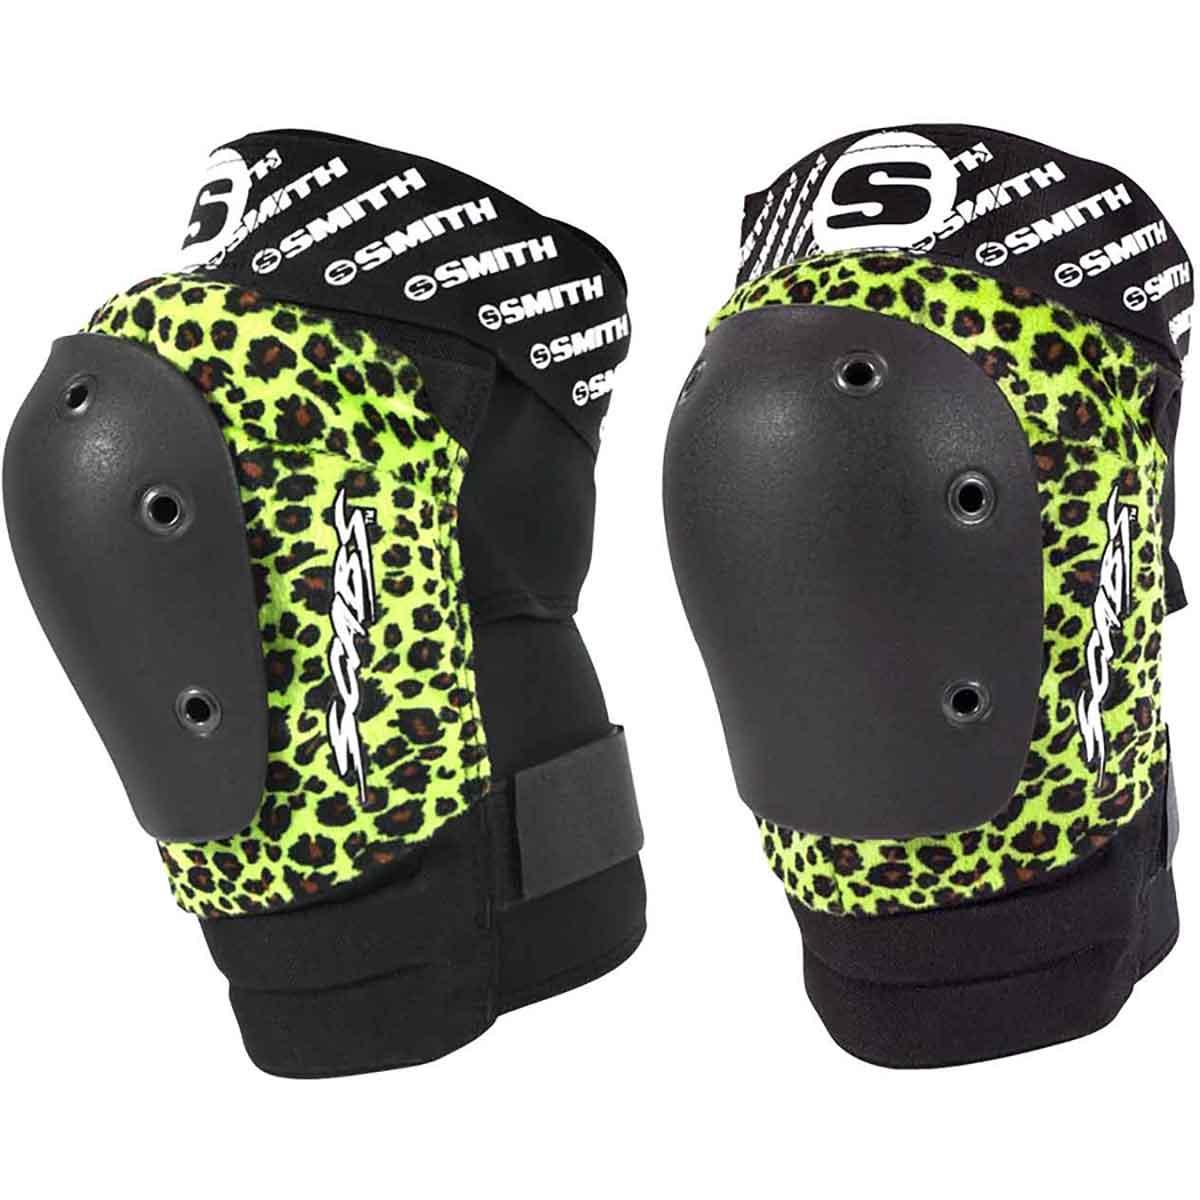 Smith Safety Gear Elite Leopard Knee Pads